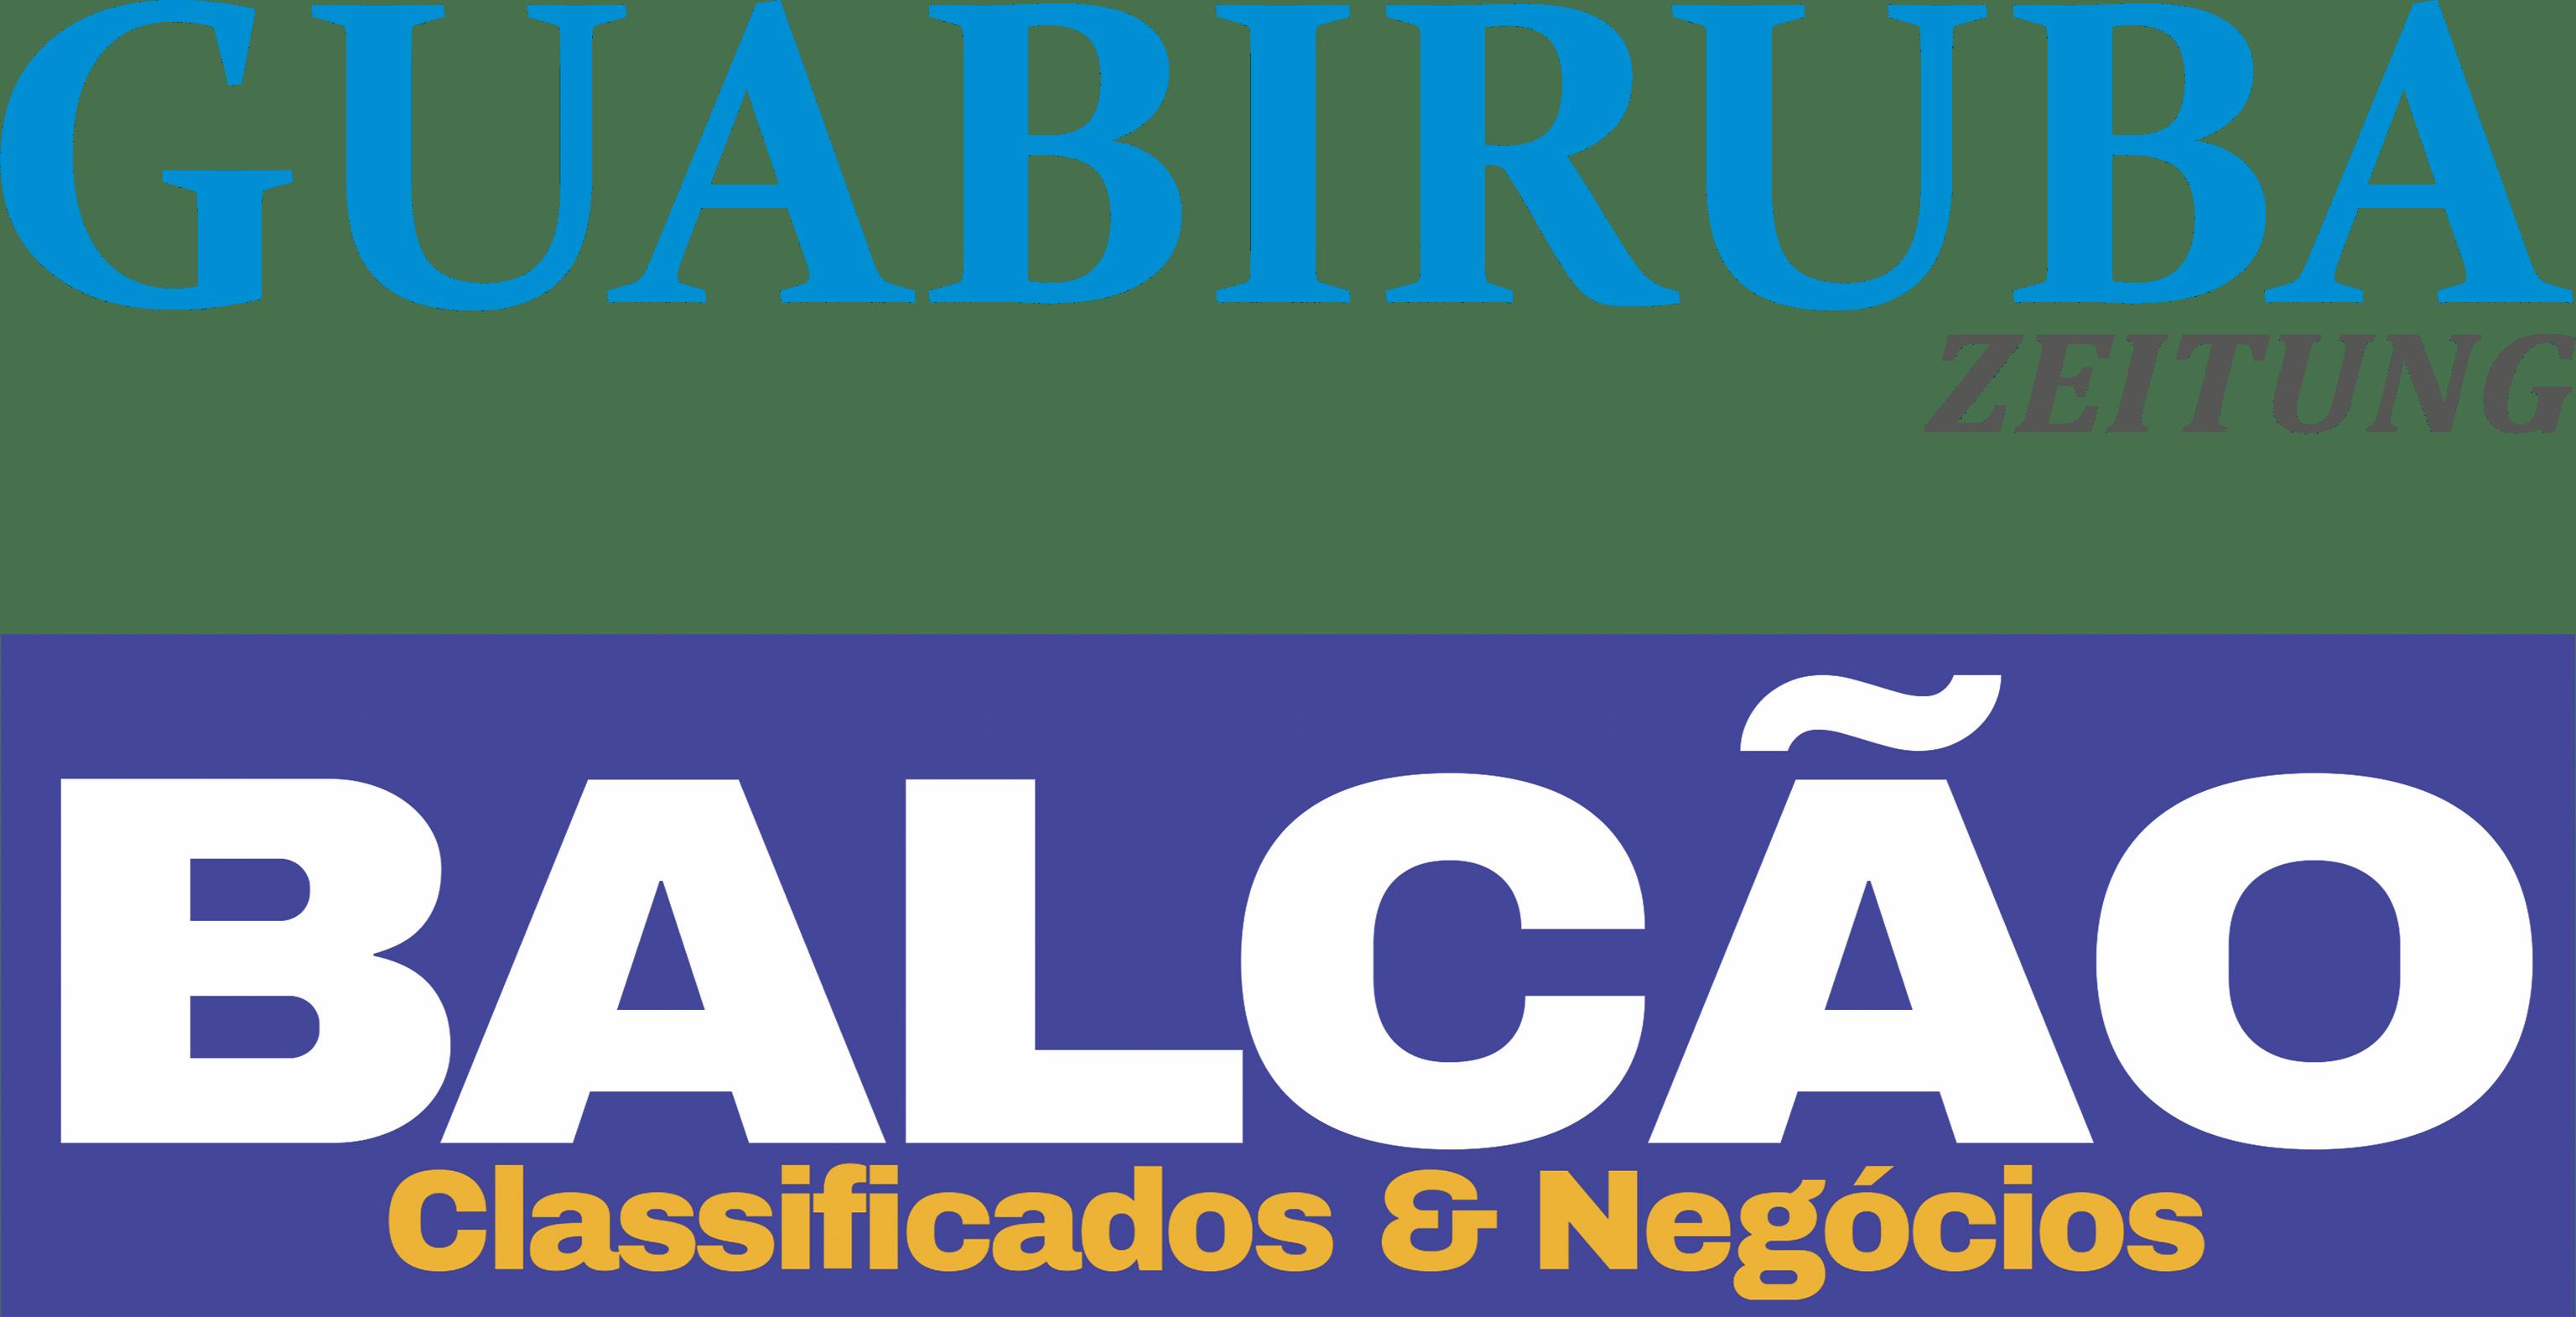 Jornal Guabiruba Zeitung - Notícias de Guabiruba